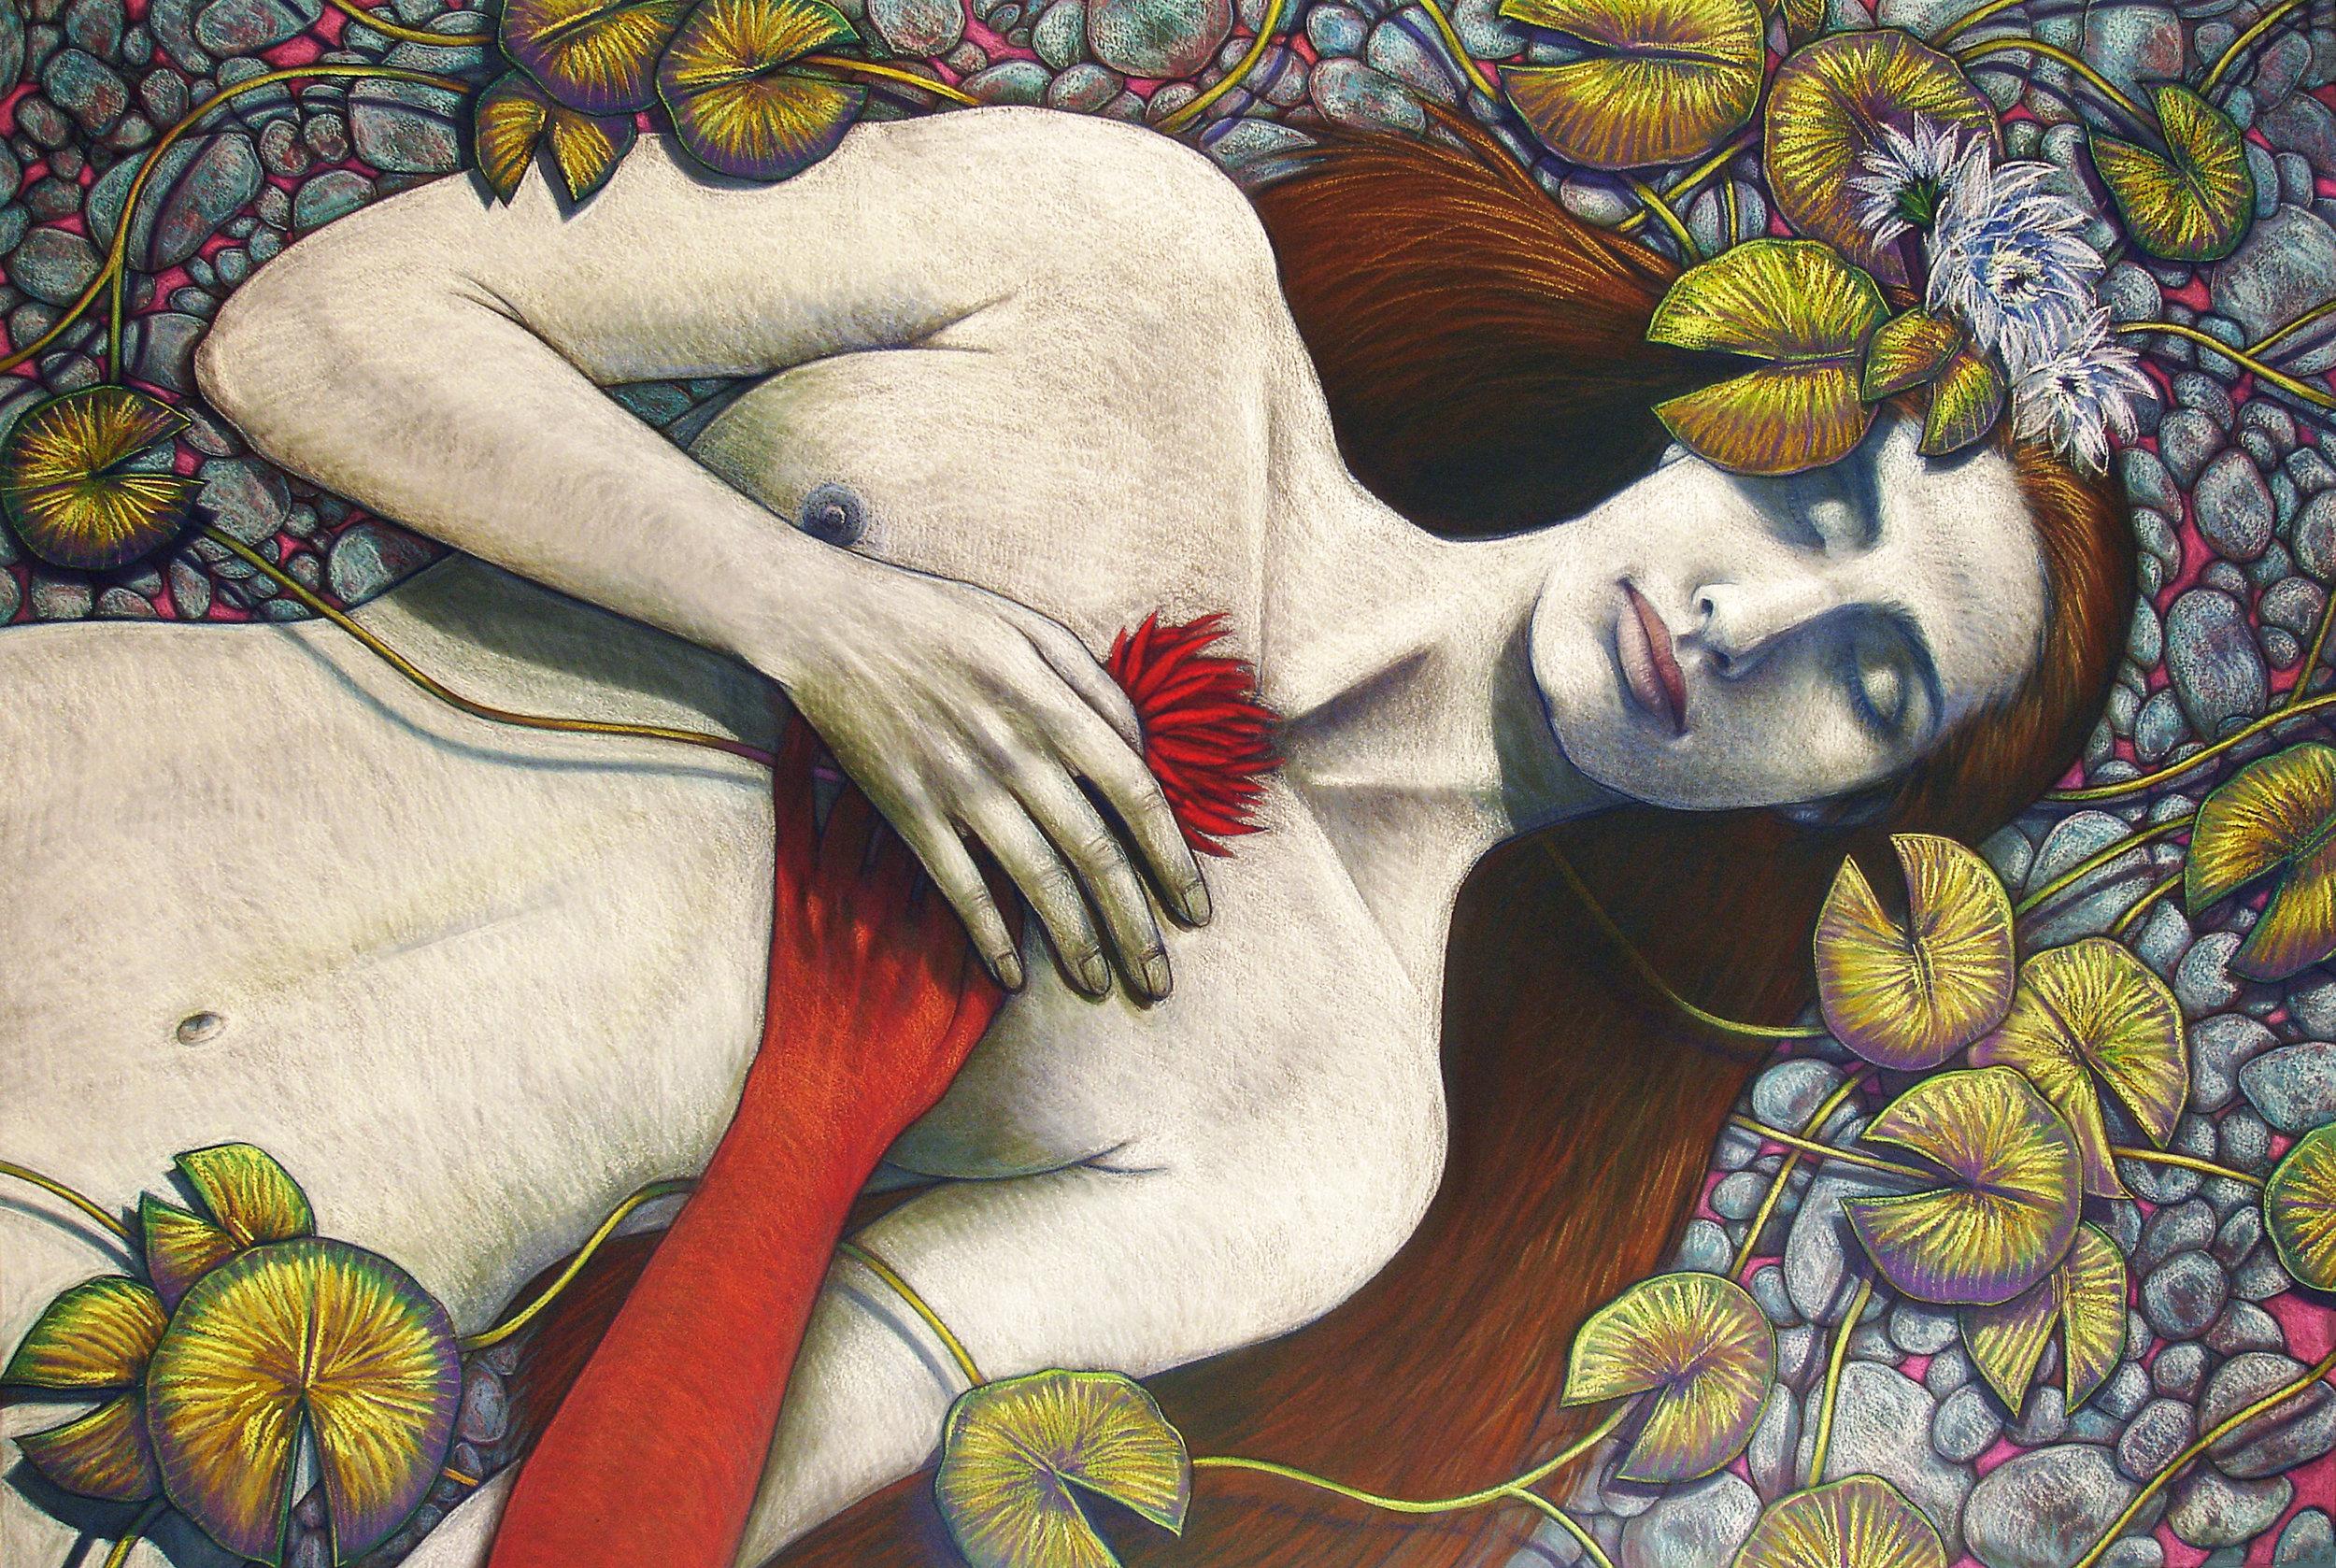 Judithe Hernández (US, b. 1948)   The Birth of Eve / El nacimiento de Eva  (The Adam & Eve Series), 2010. Pastel on paper, 30 x 44 inches